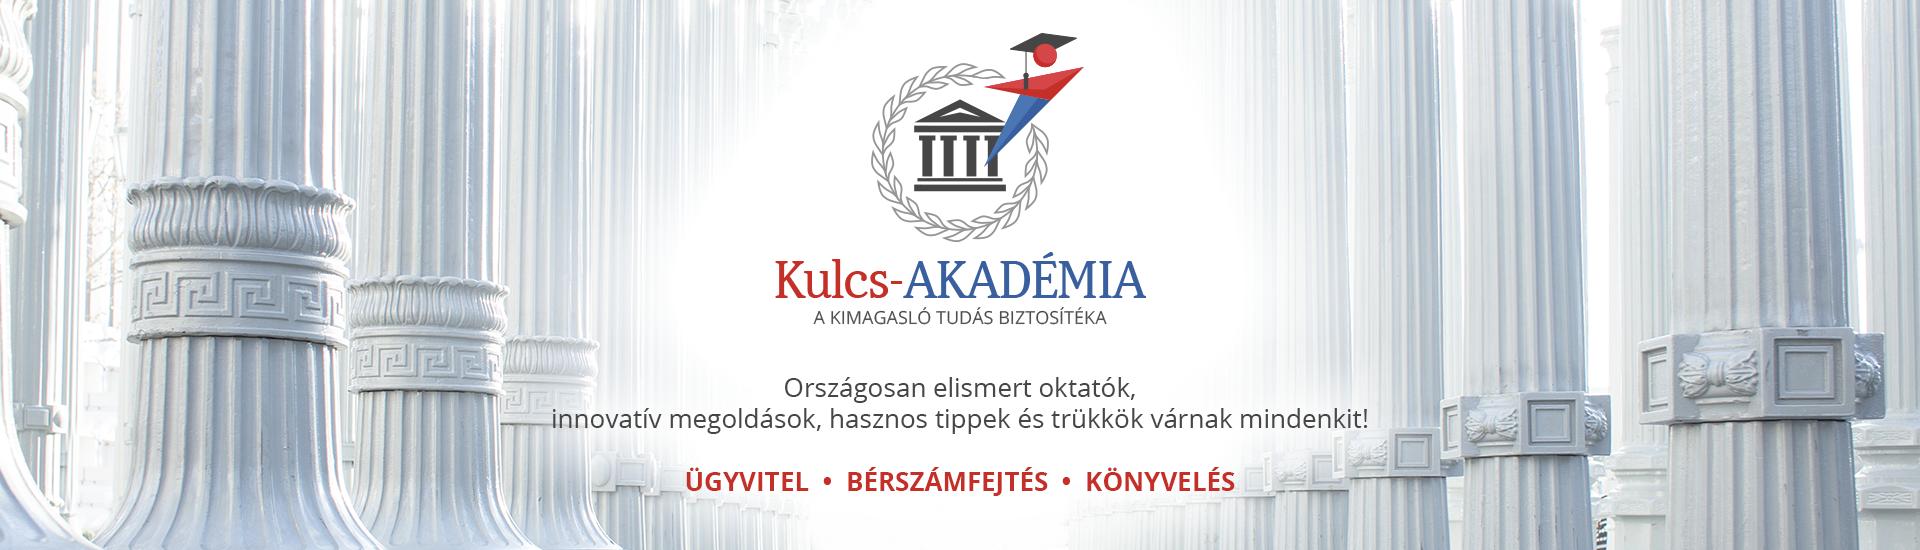 Kulcs-Soft Akadémia